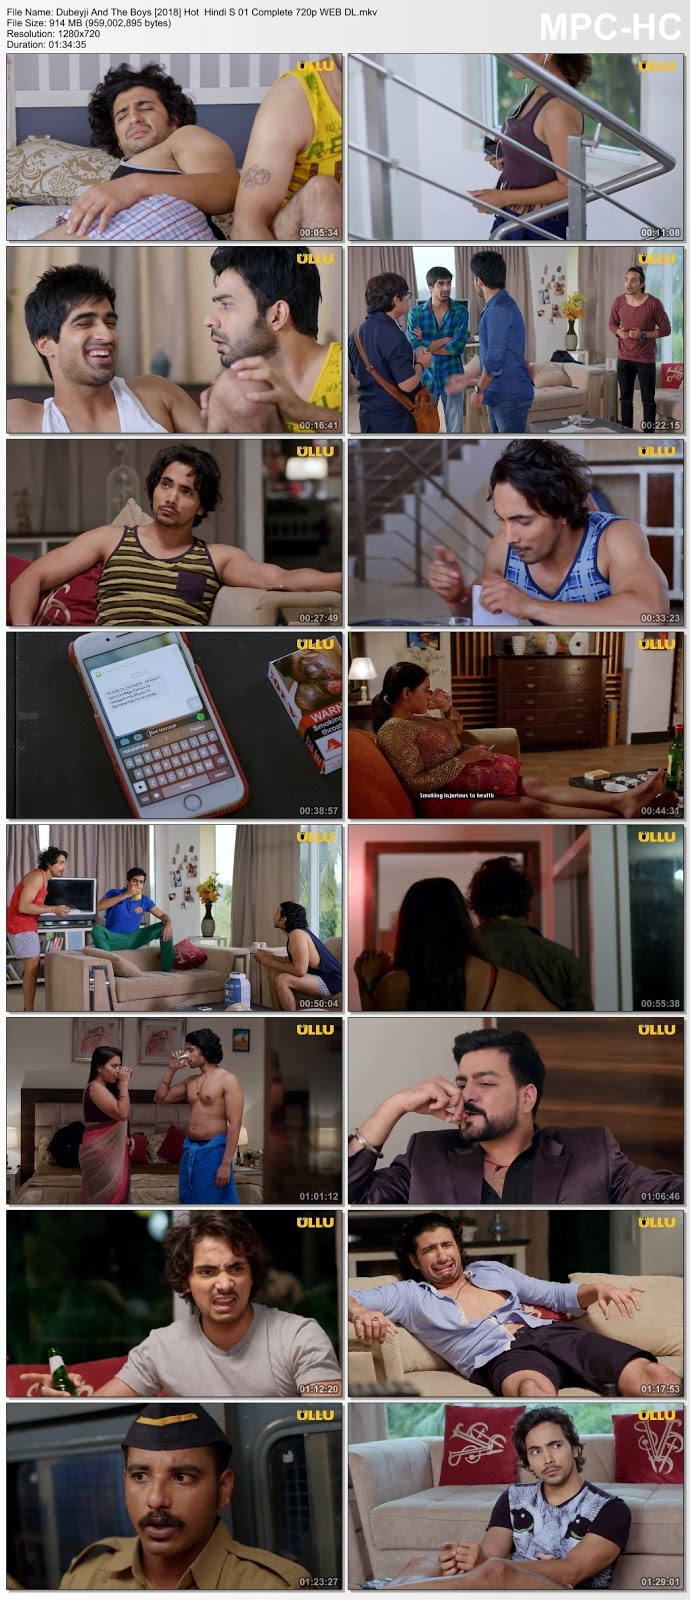 Dubeyji And The Boys [2018] Hindi S 01 Complete 720p WEB DL – 900MB Desirehub